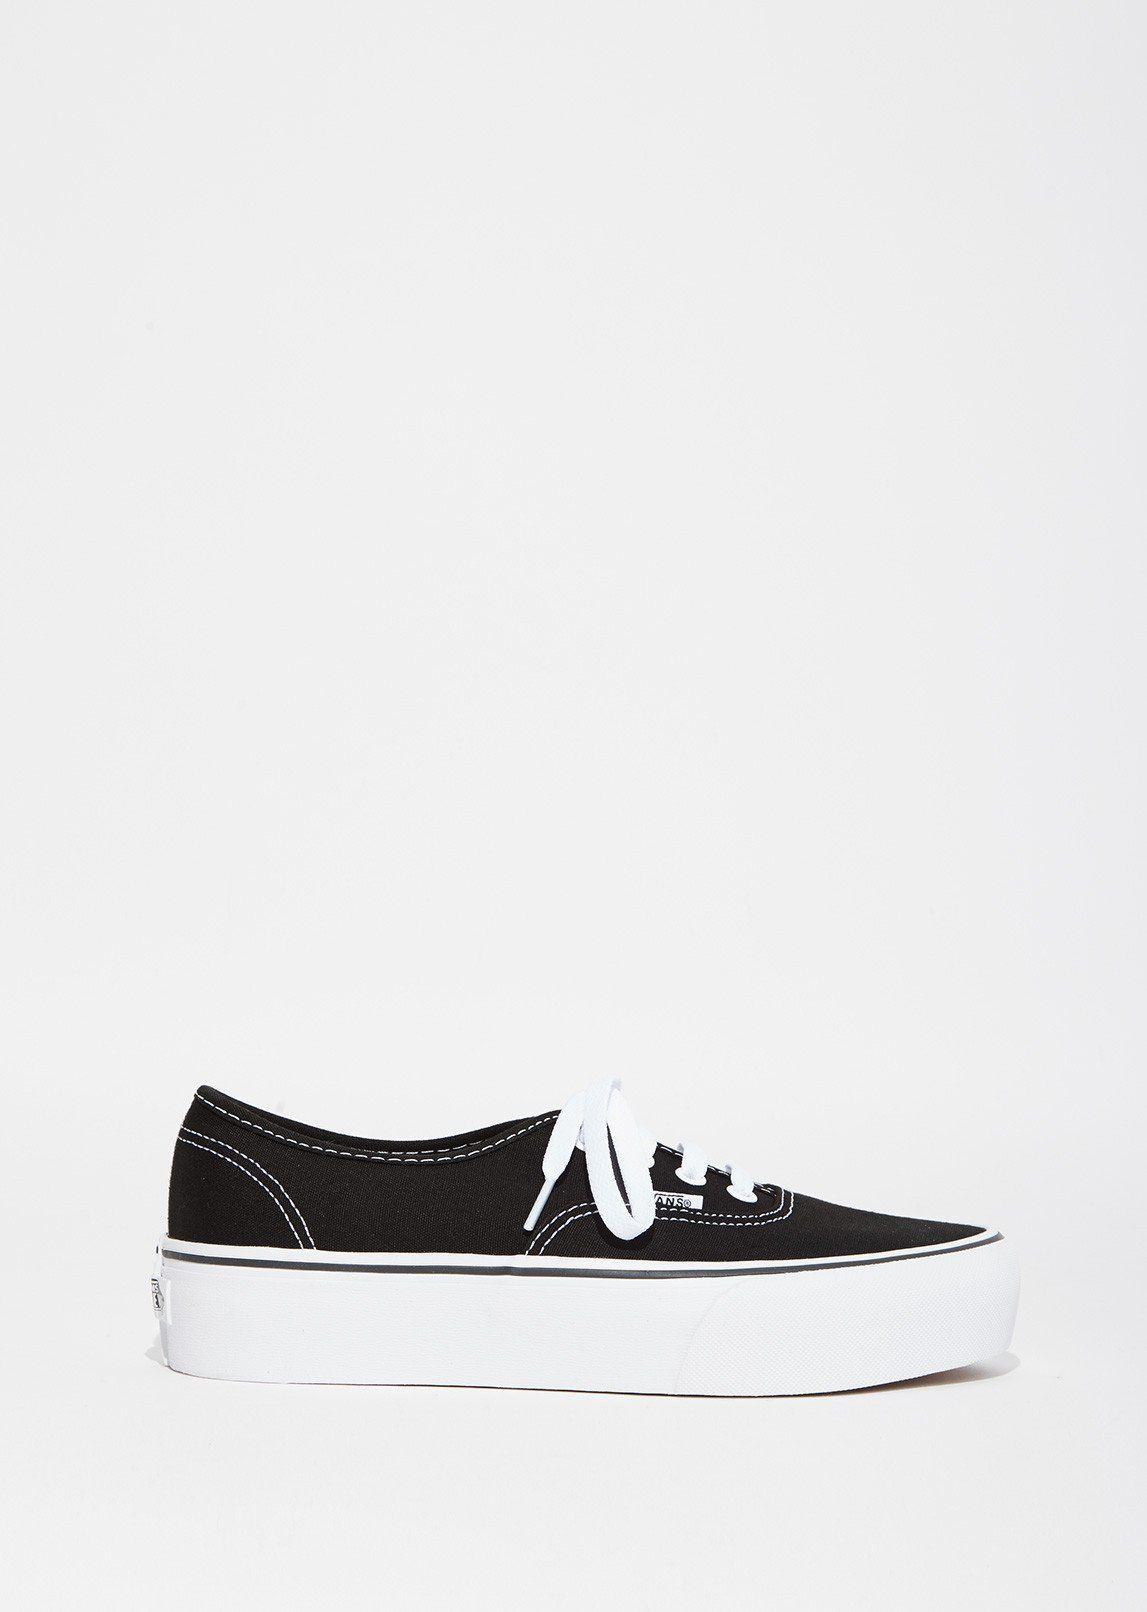 29bec552c3d Authentic Platform Sneakers